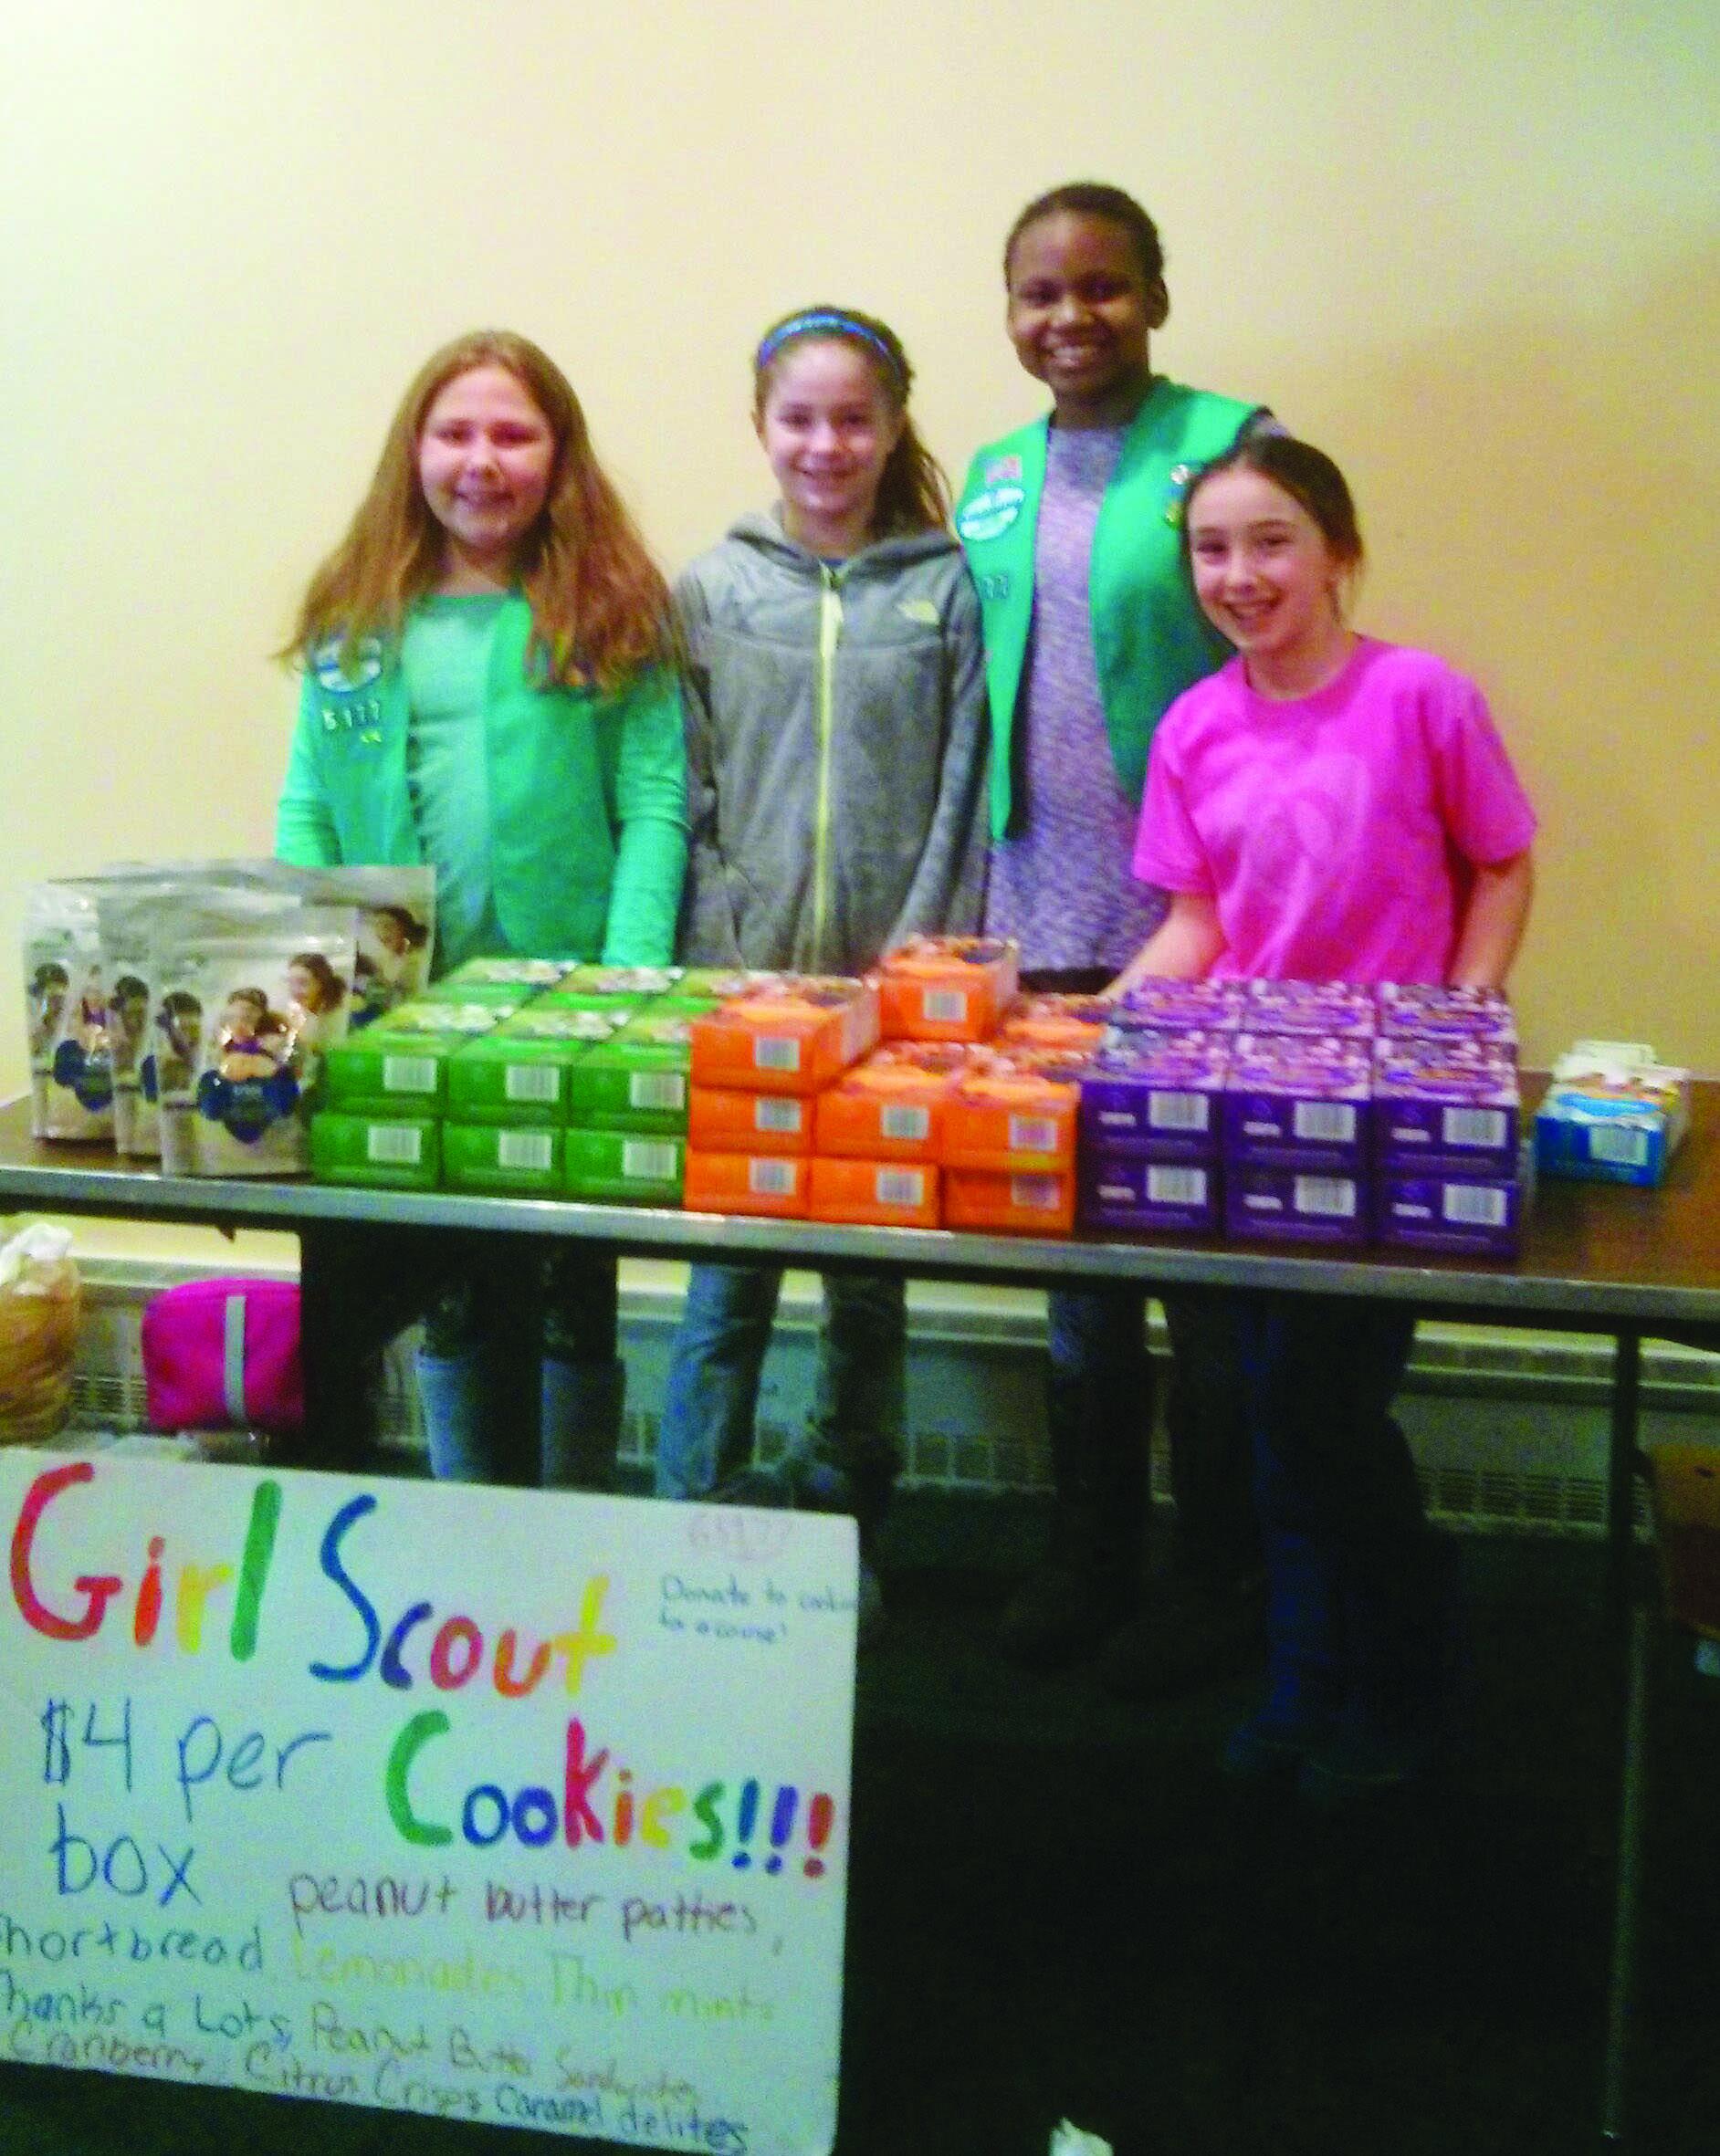 needham girl scouts selling cookies